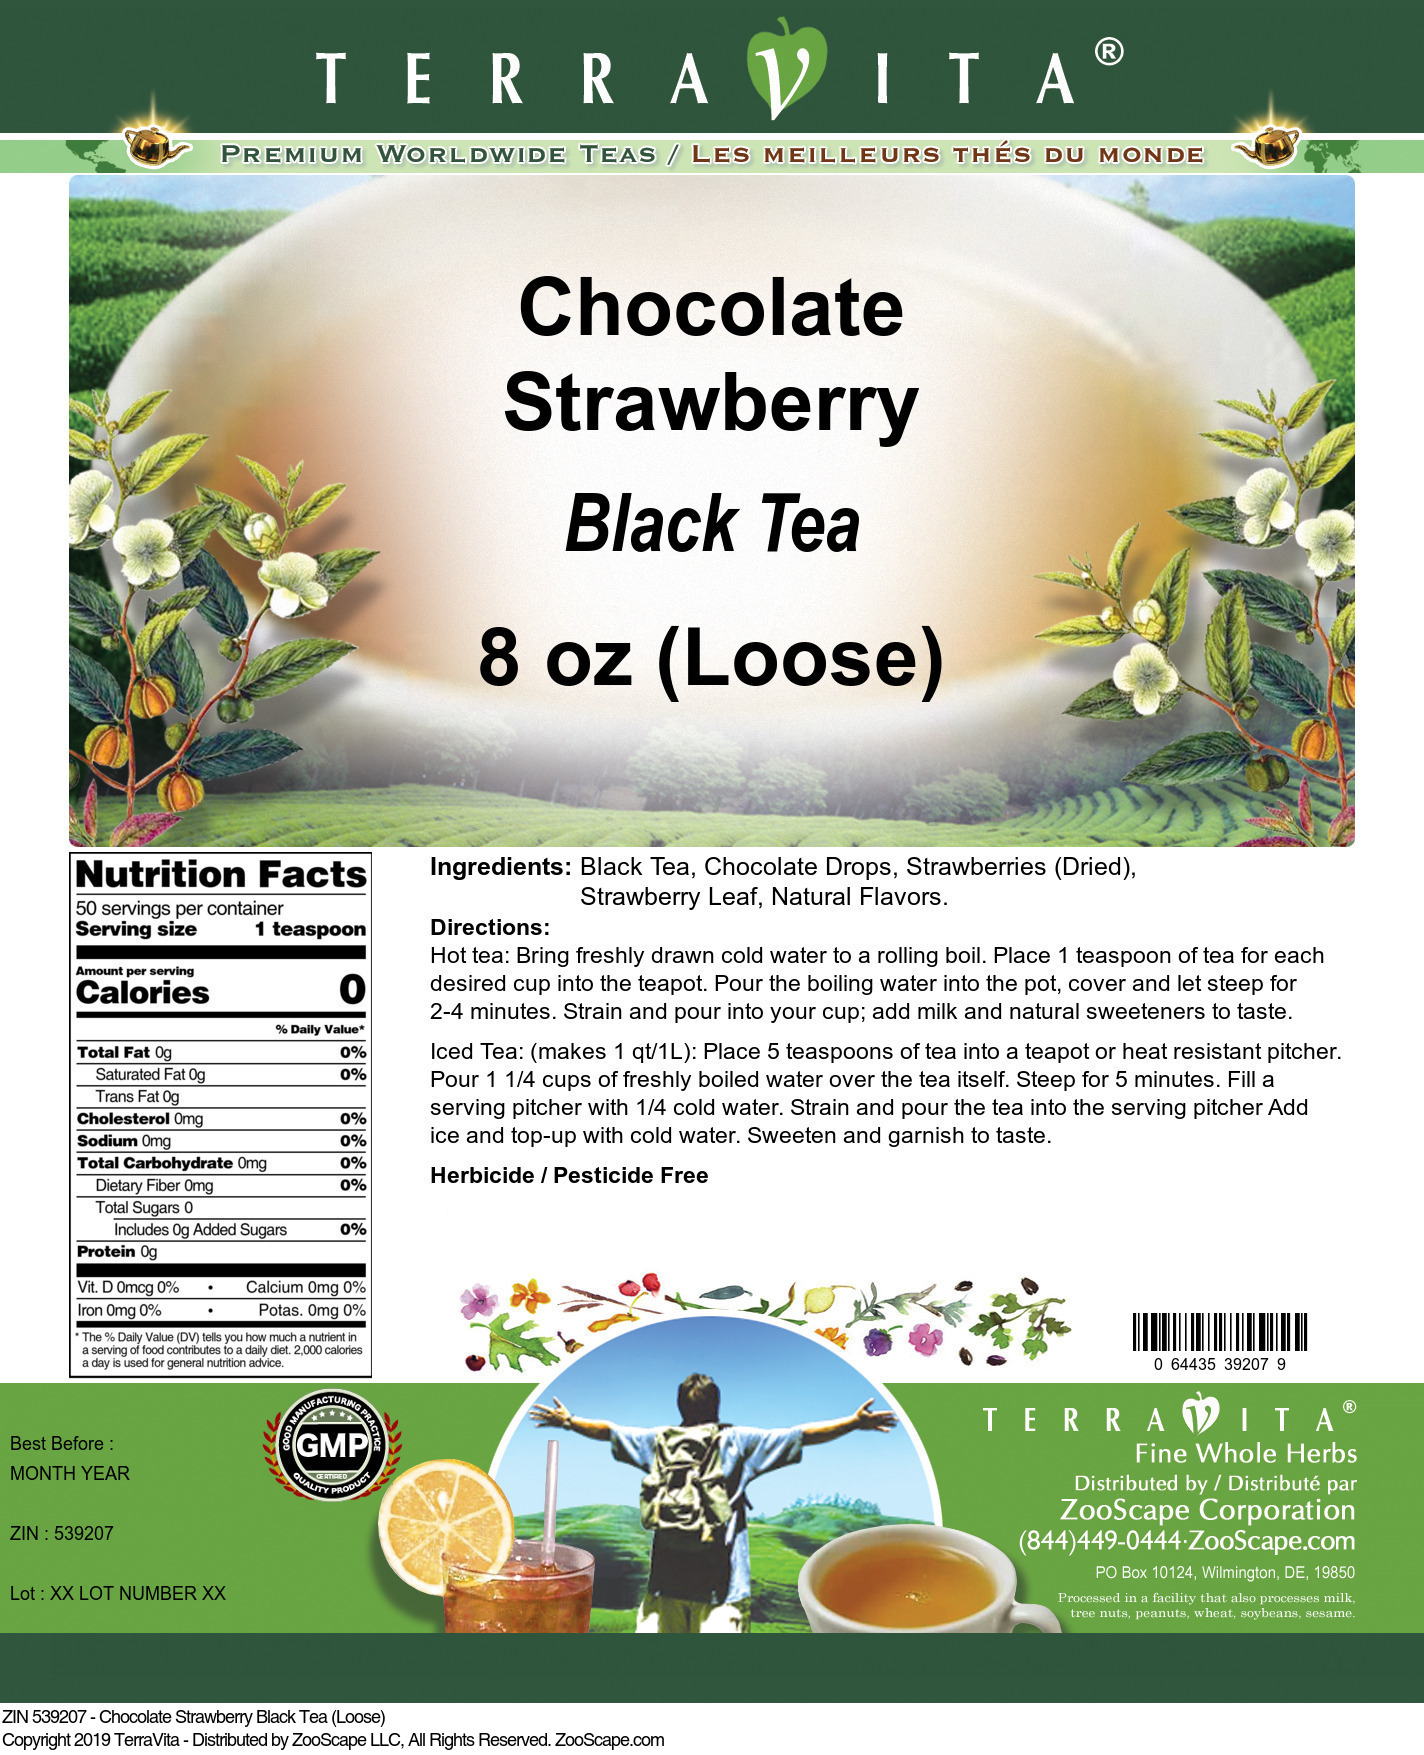 Chocolate Strawberry Black Tea (Loose)